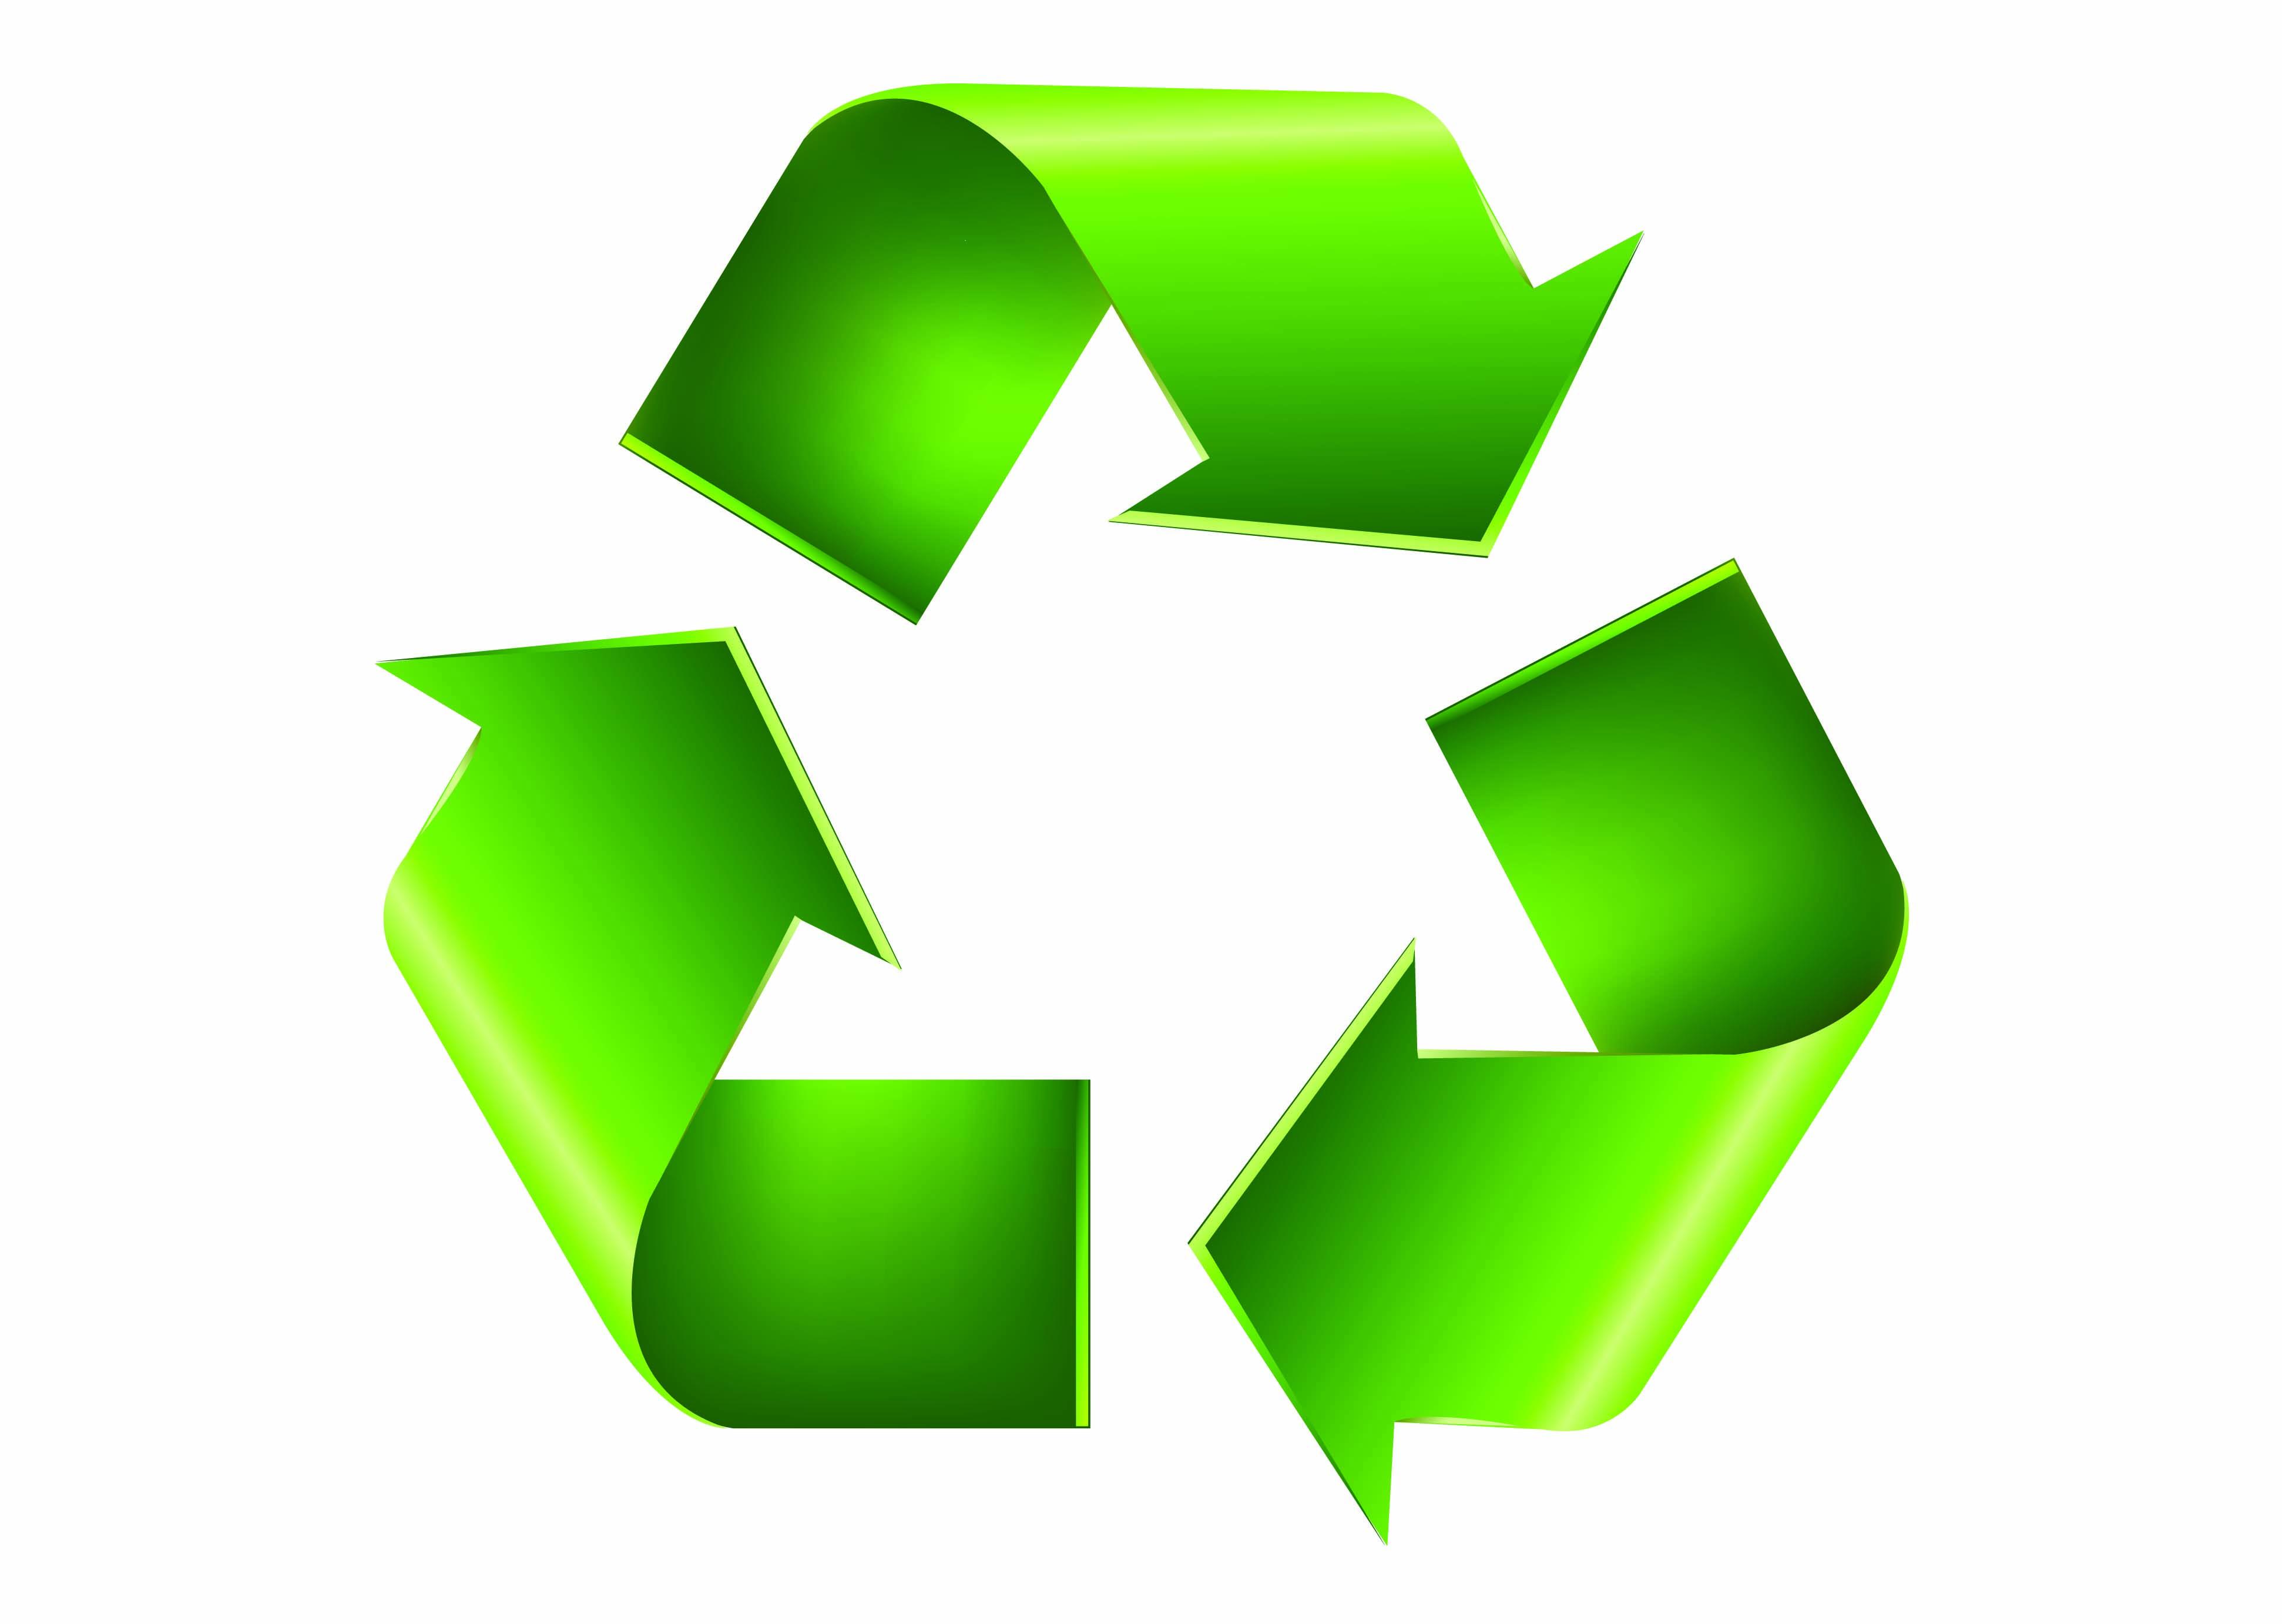 3884x2764 Kempton Spca To Stop Recycling Kempton Express